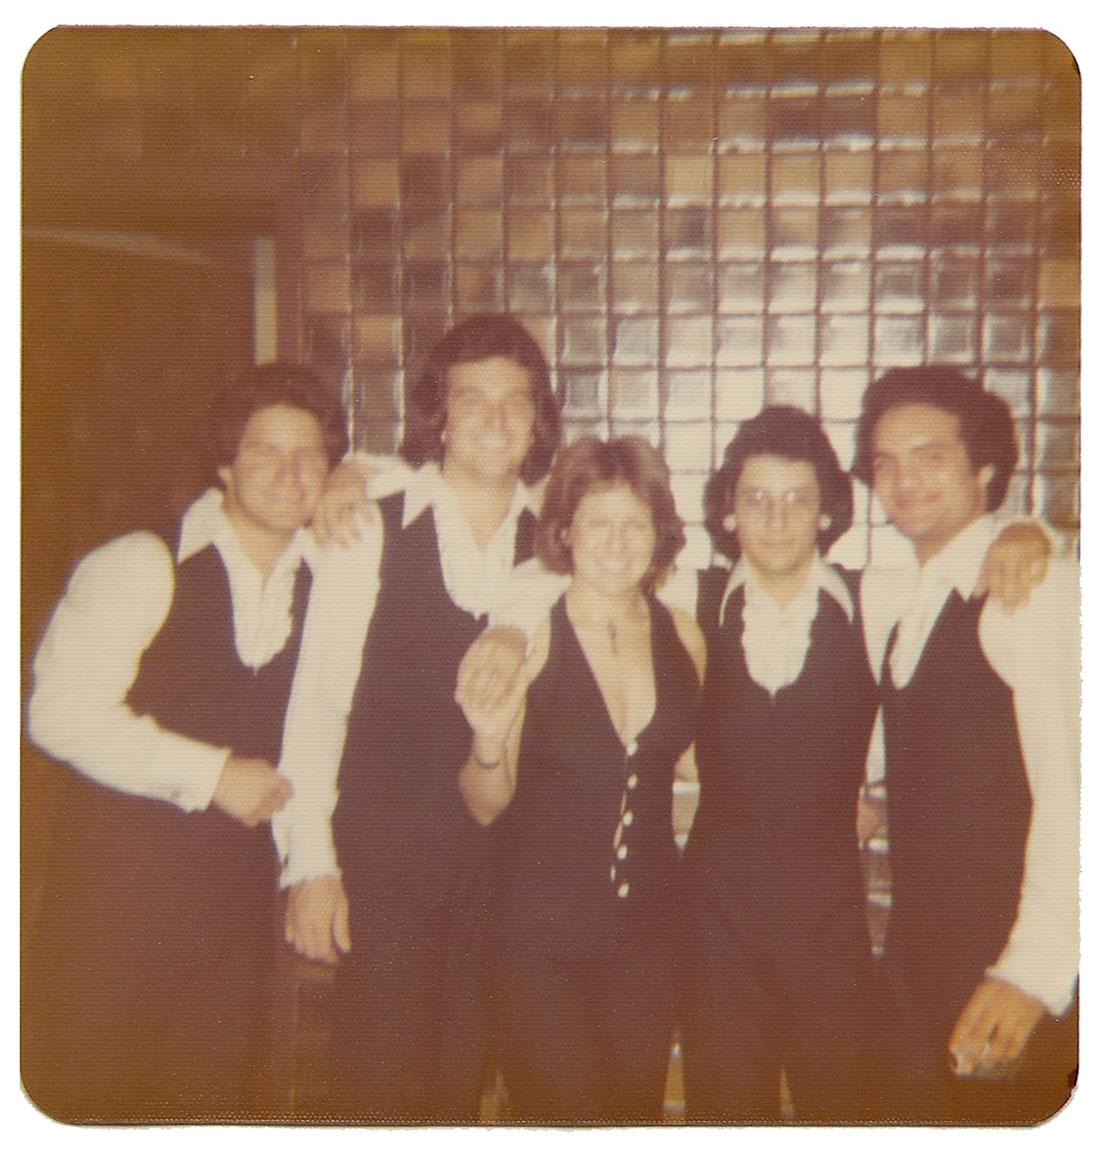 Alex Cobos, Frank Miret, Lina Argulelles, Carlos Segura and Alfredo Perez at Mr. Pip's.